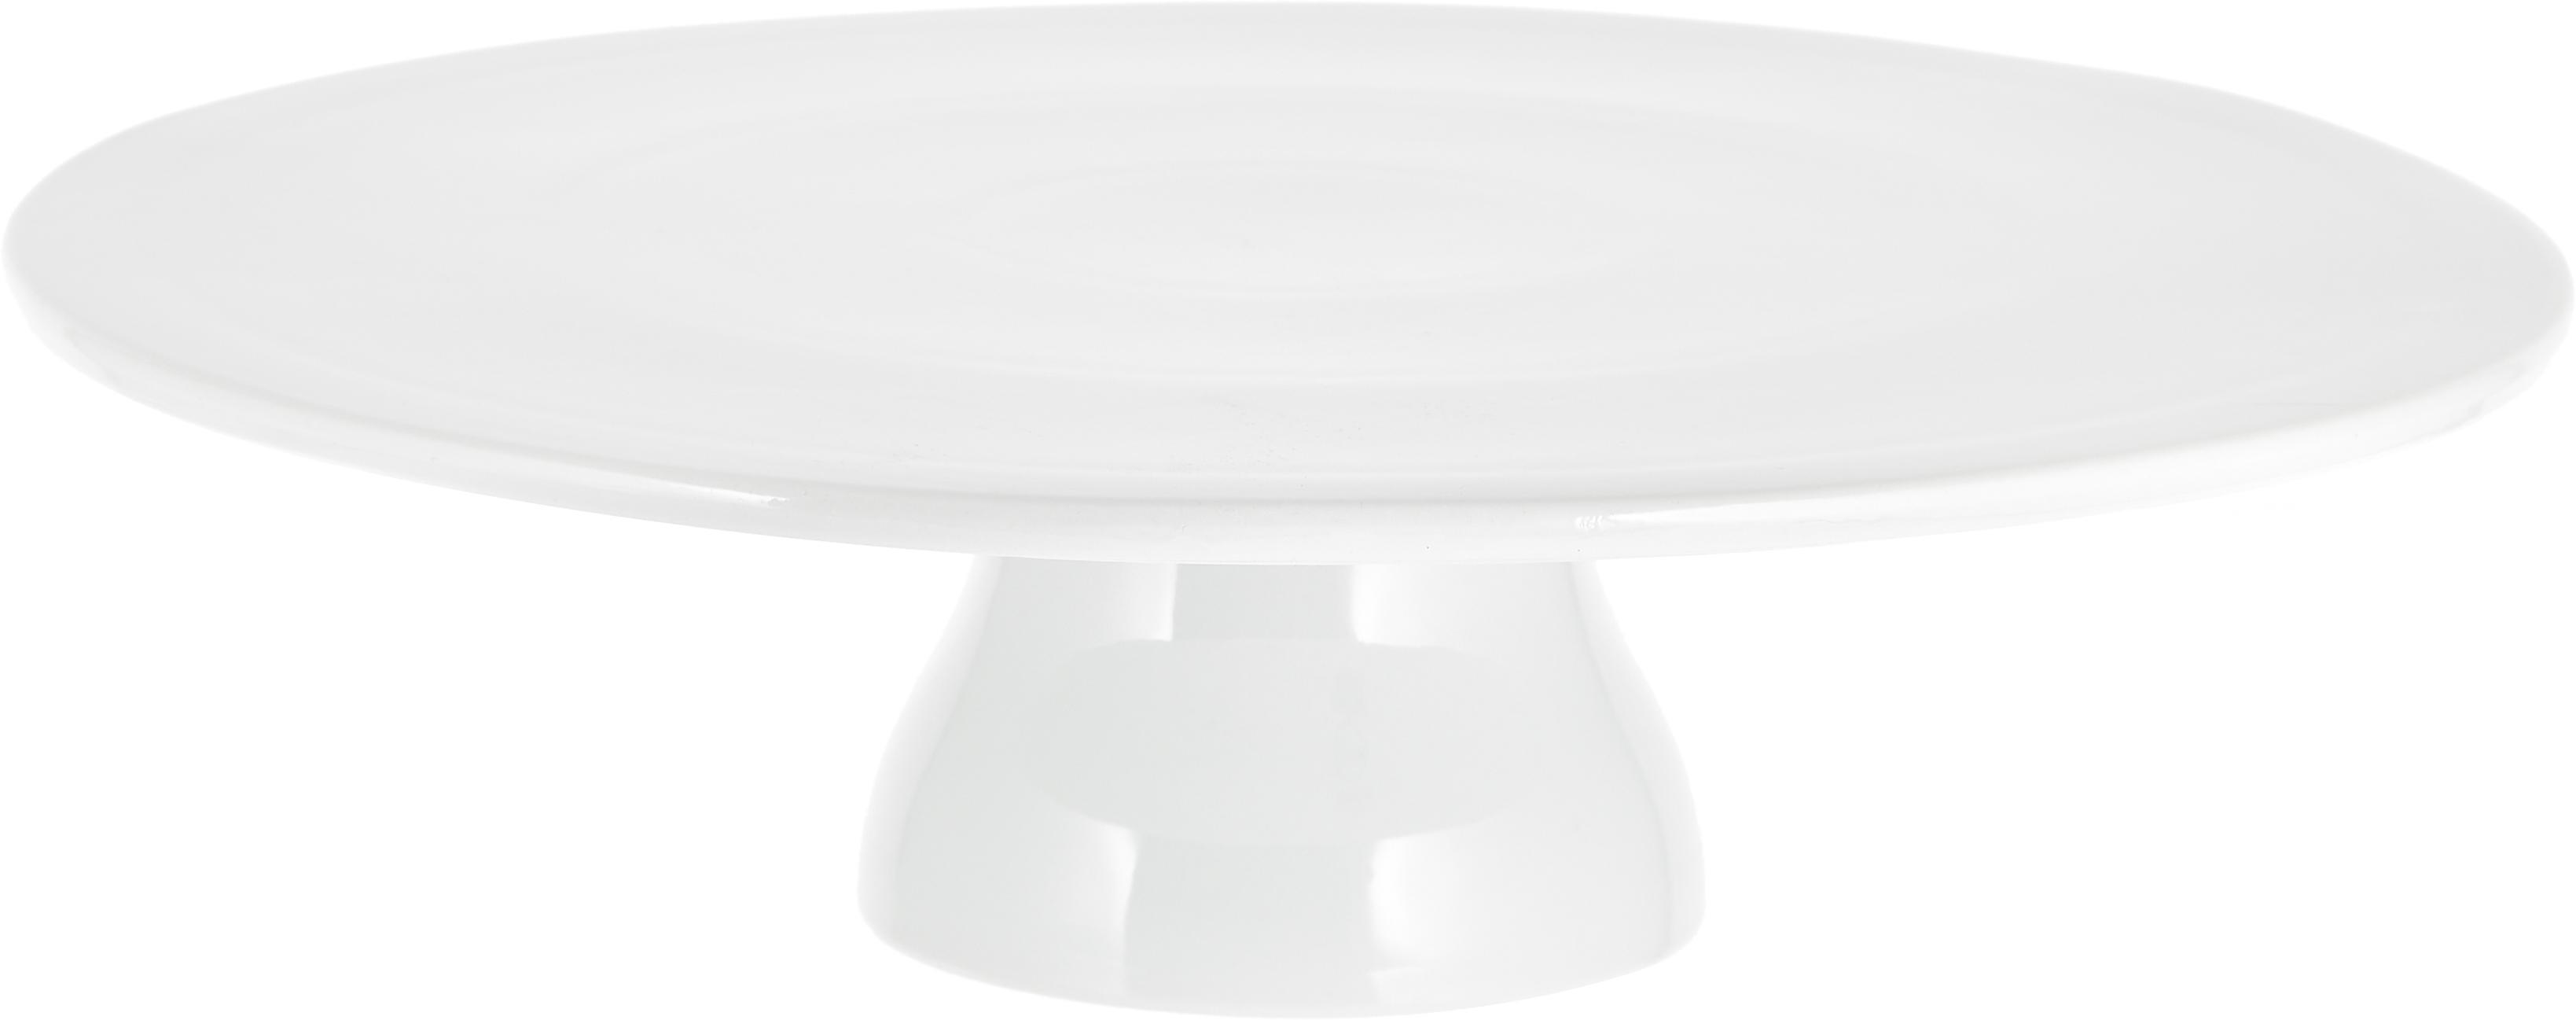 Alzata per dolci Yanis, Porcellana, Bianco, Ø 33 cm